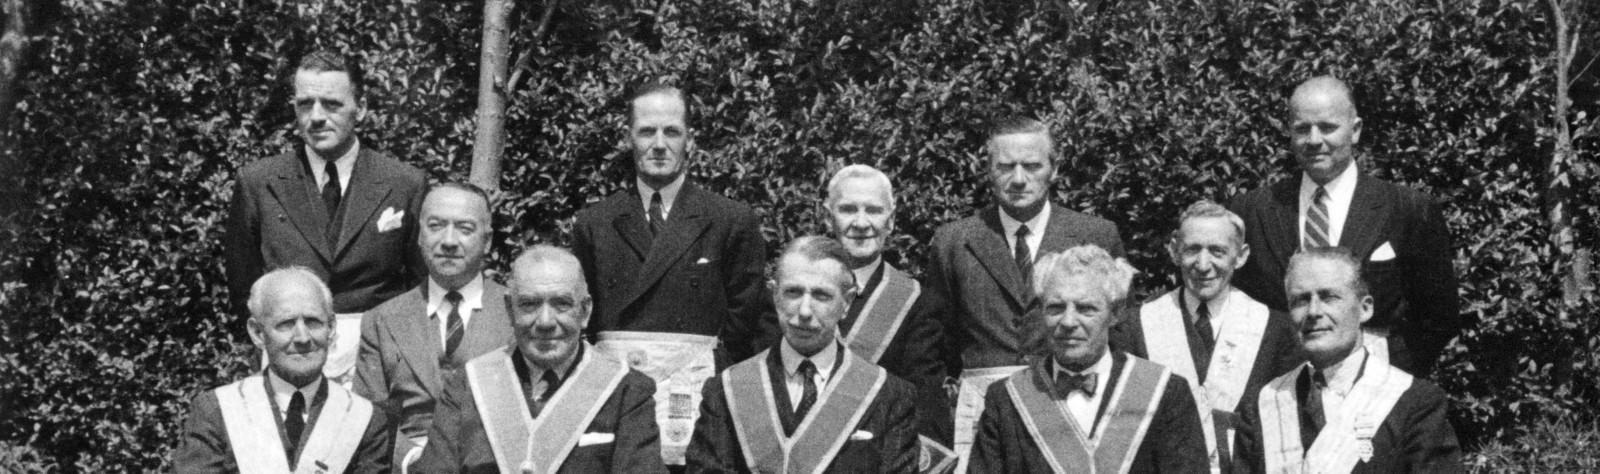 Lodge History